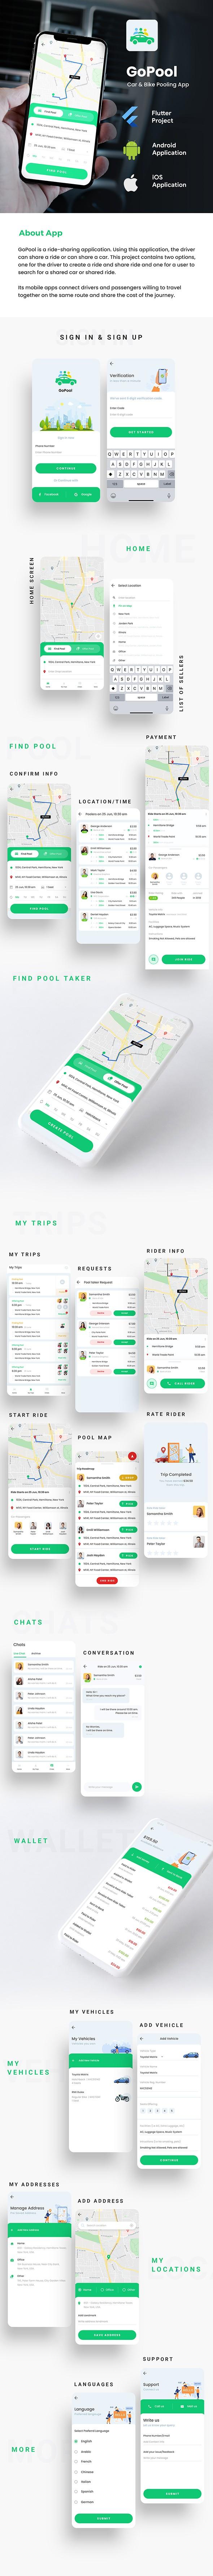 Car Pooling Bike Pooling Android App template + iOS App Template| Flutter | Gopool - 1